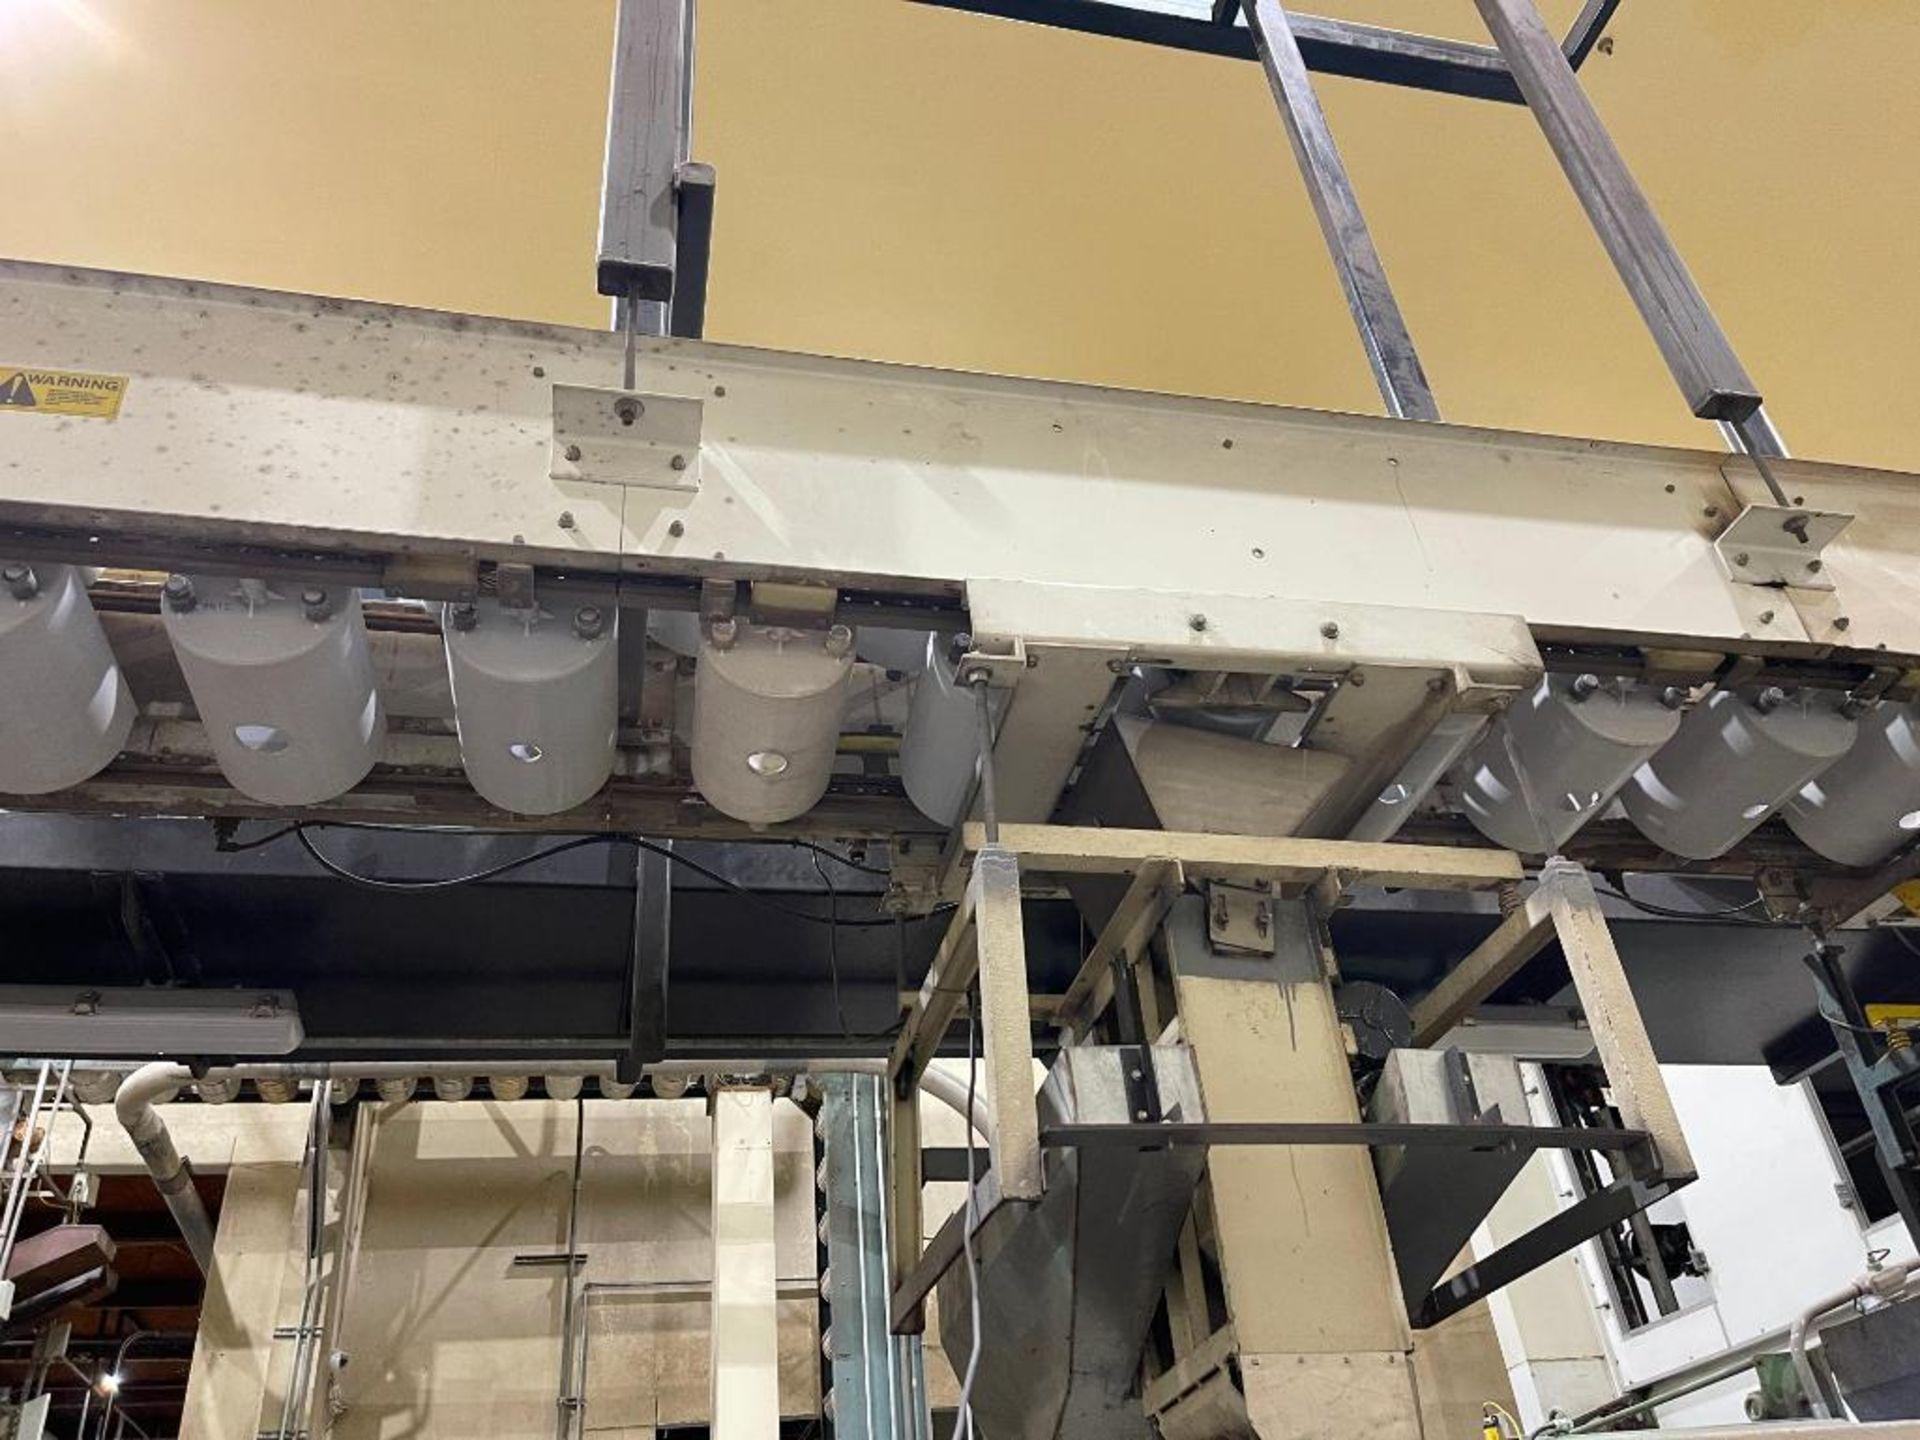 Meyer horizontal bucket elevator, model PQ-172-12-BCS - Image 7 of 19